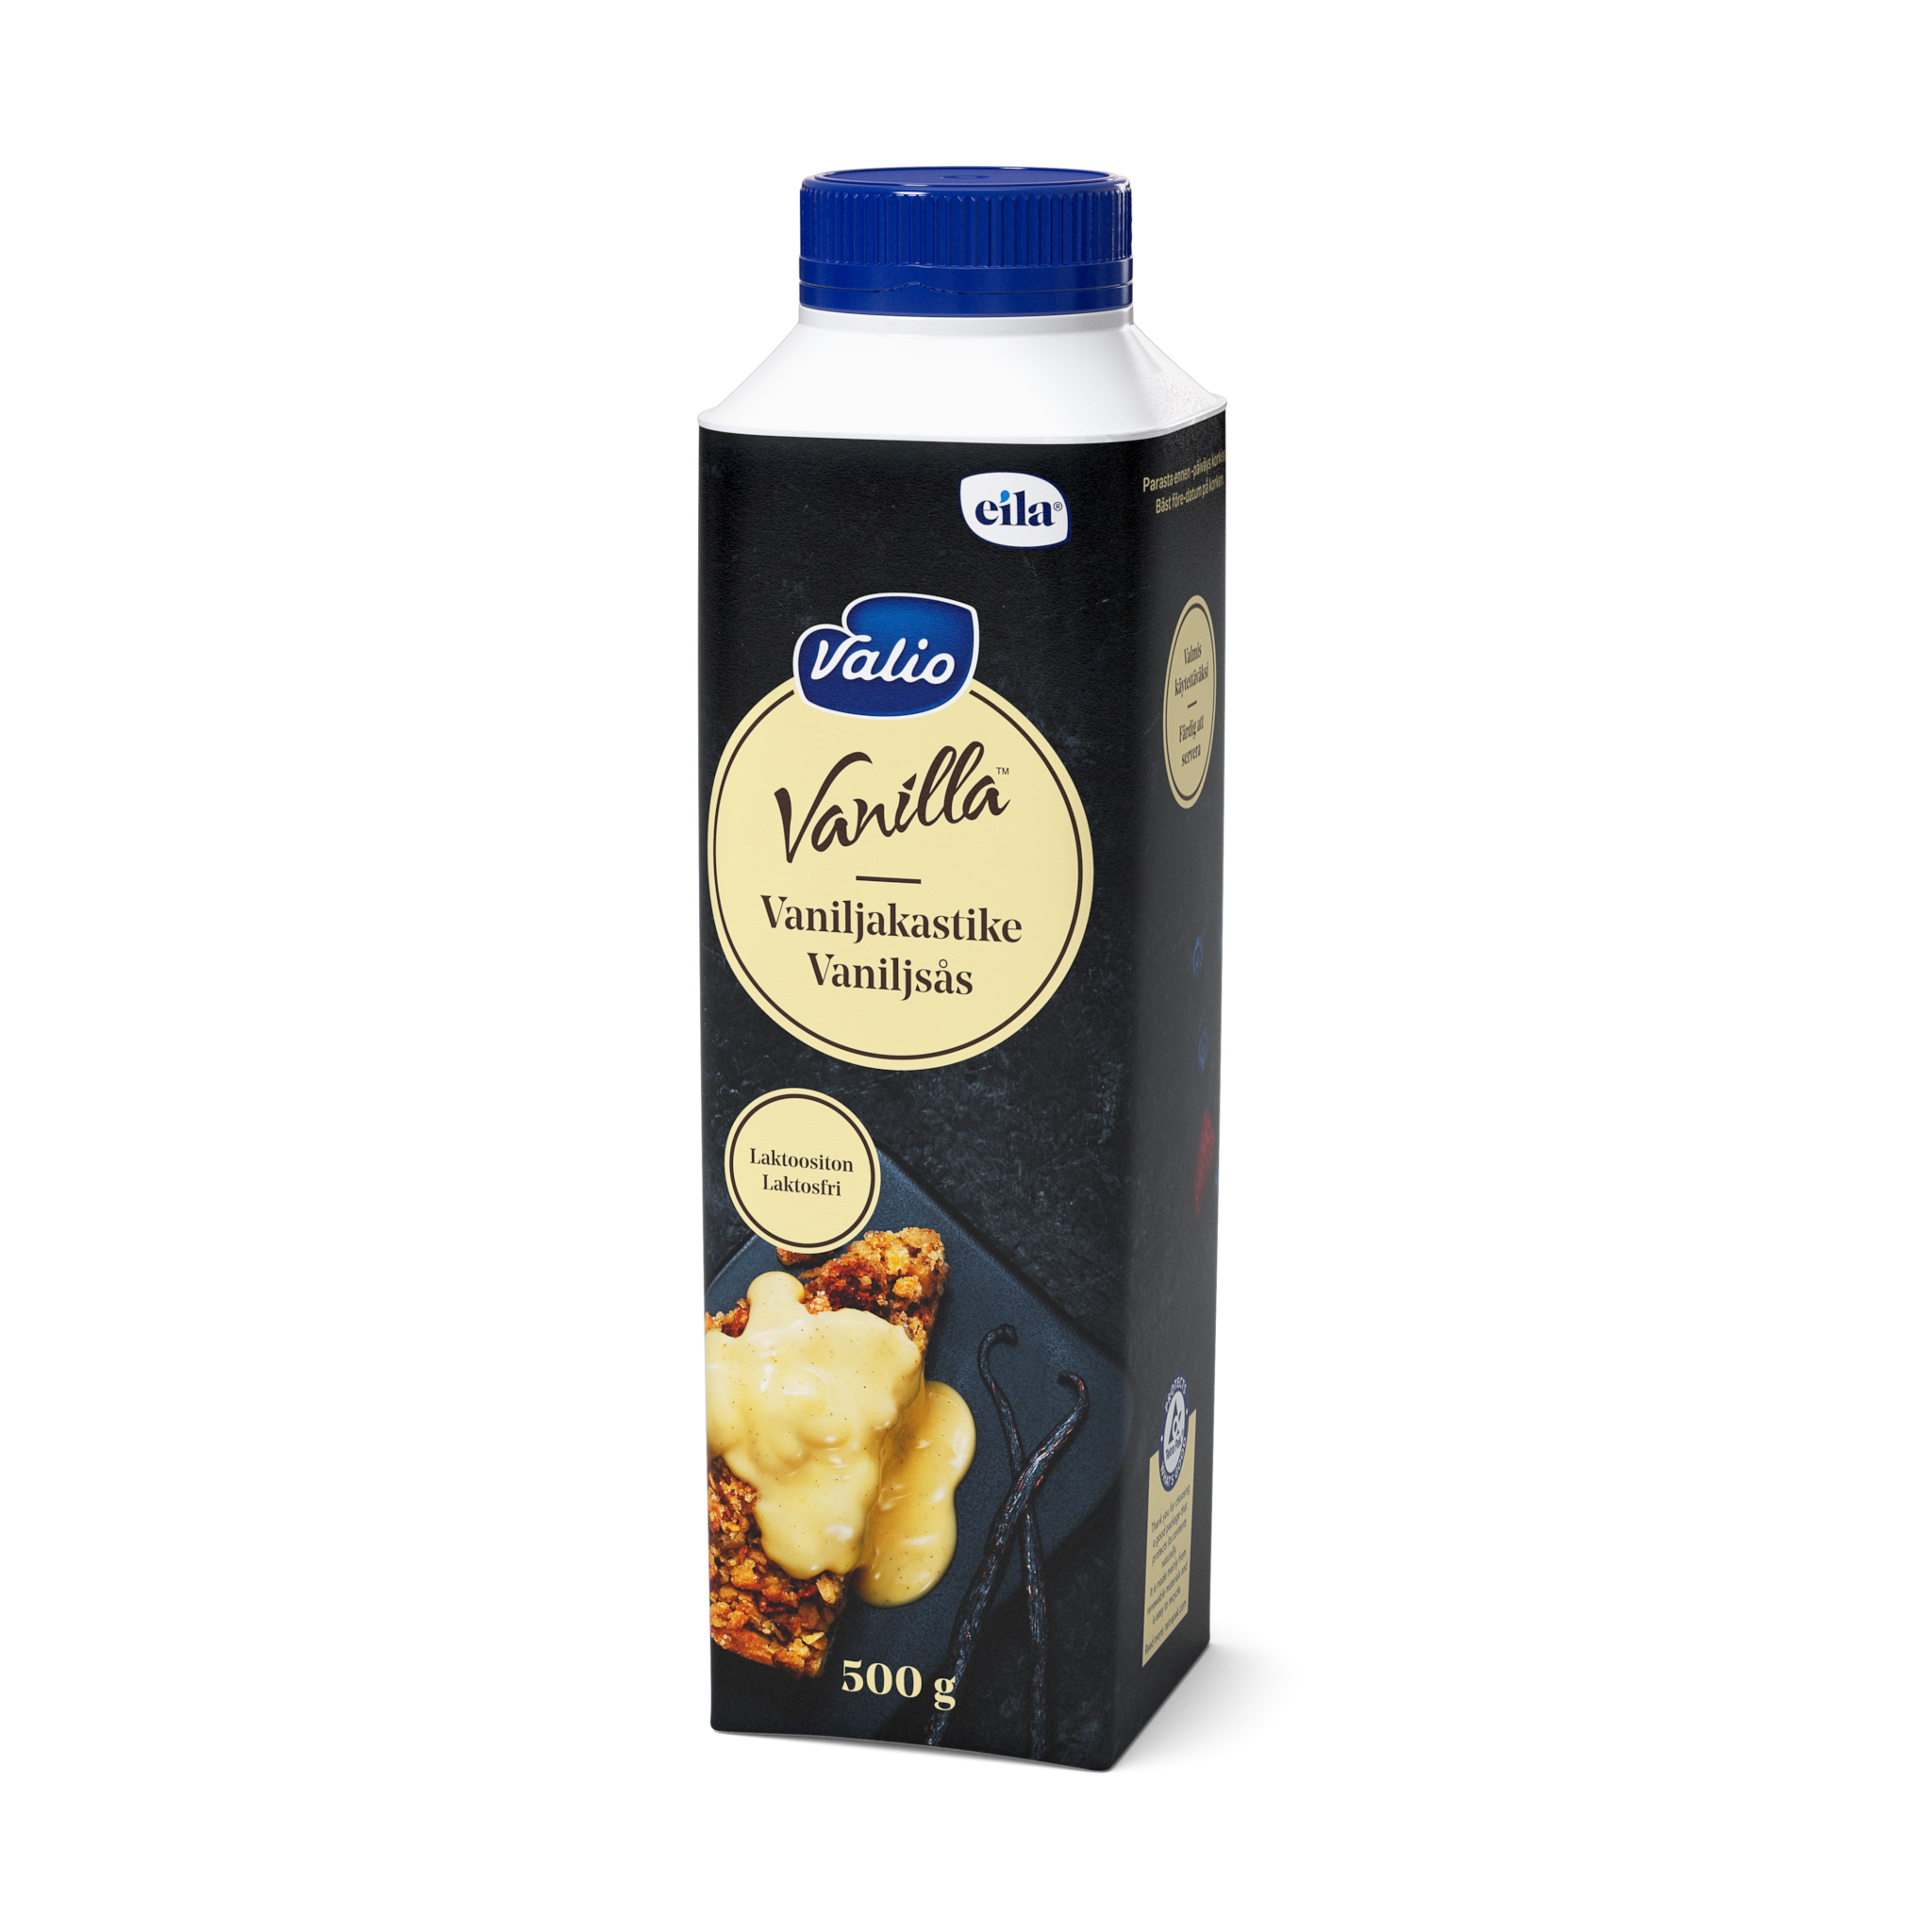 Valio Vanilla™ vaniljakastike laktoositon